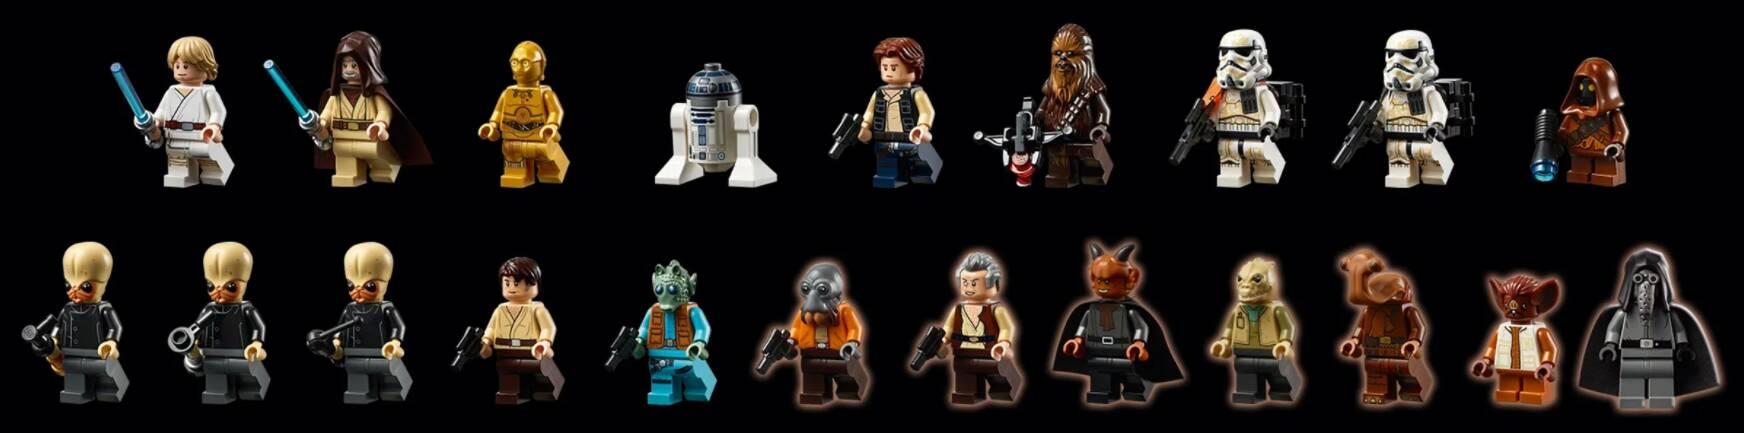 Lego Taverna Mos Eisley